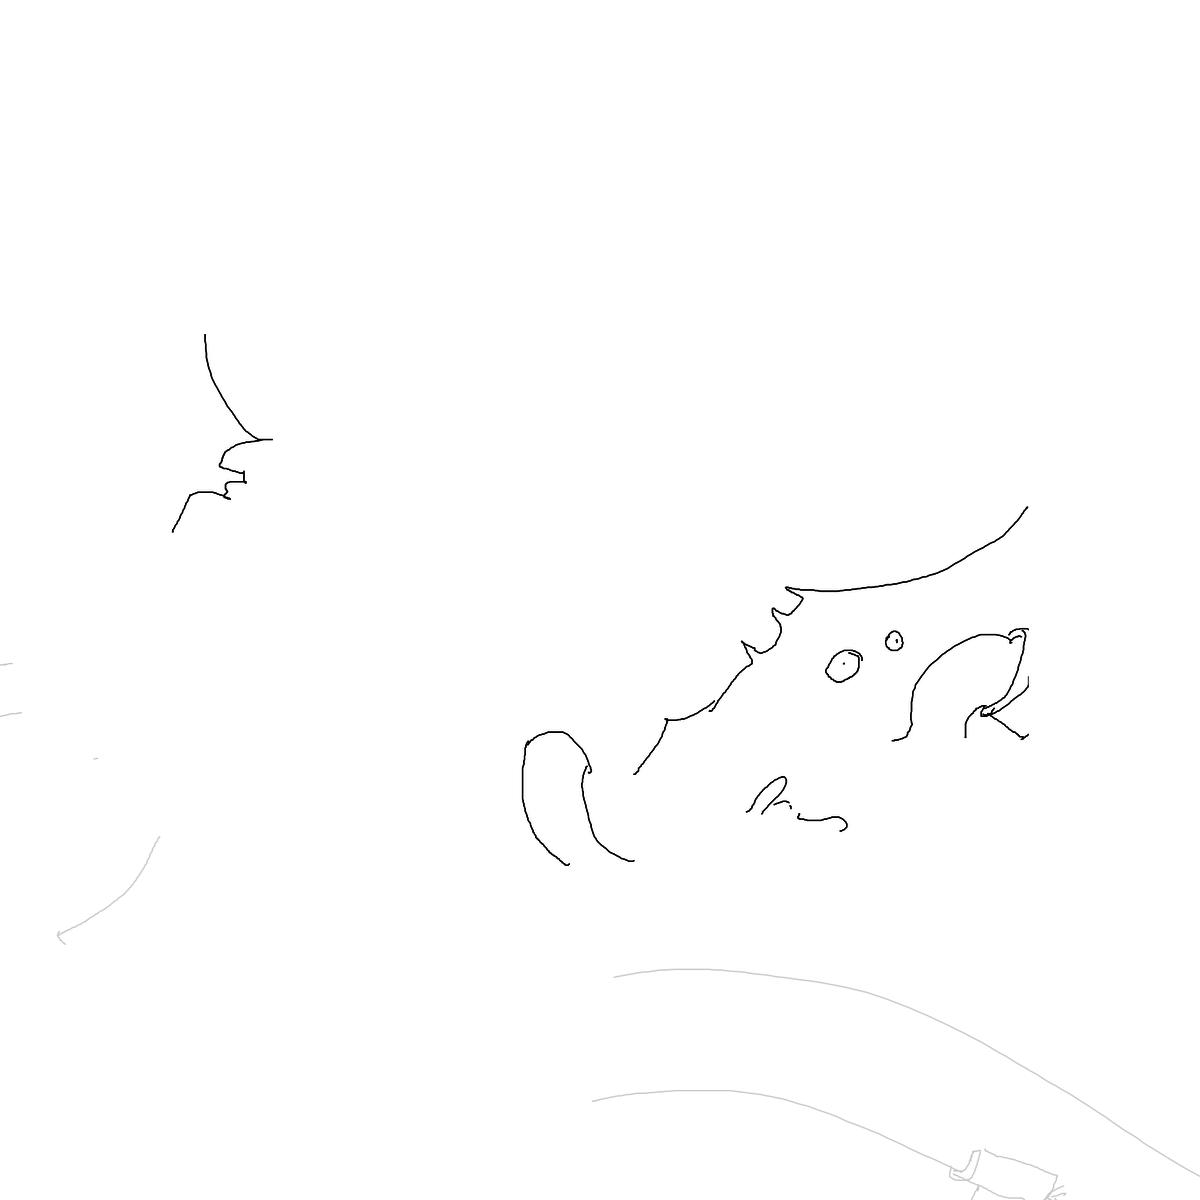 BAAAM drawing#22111 lat:78.4174575805664000lng: -4.4292011260986330